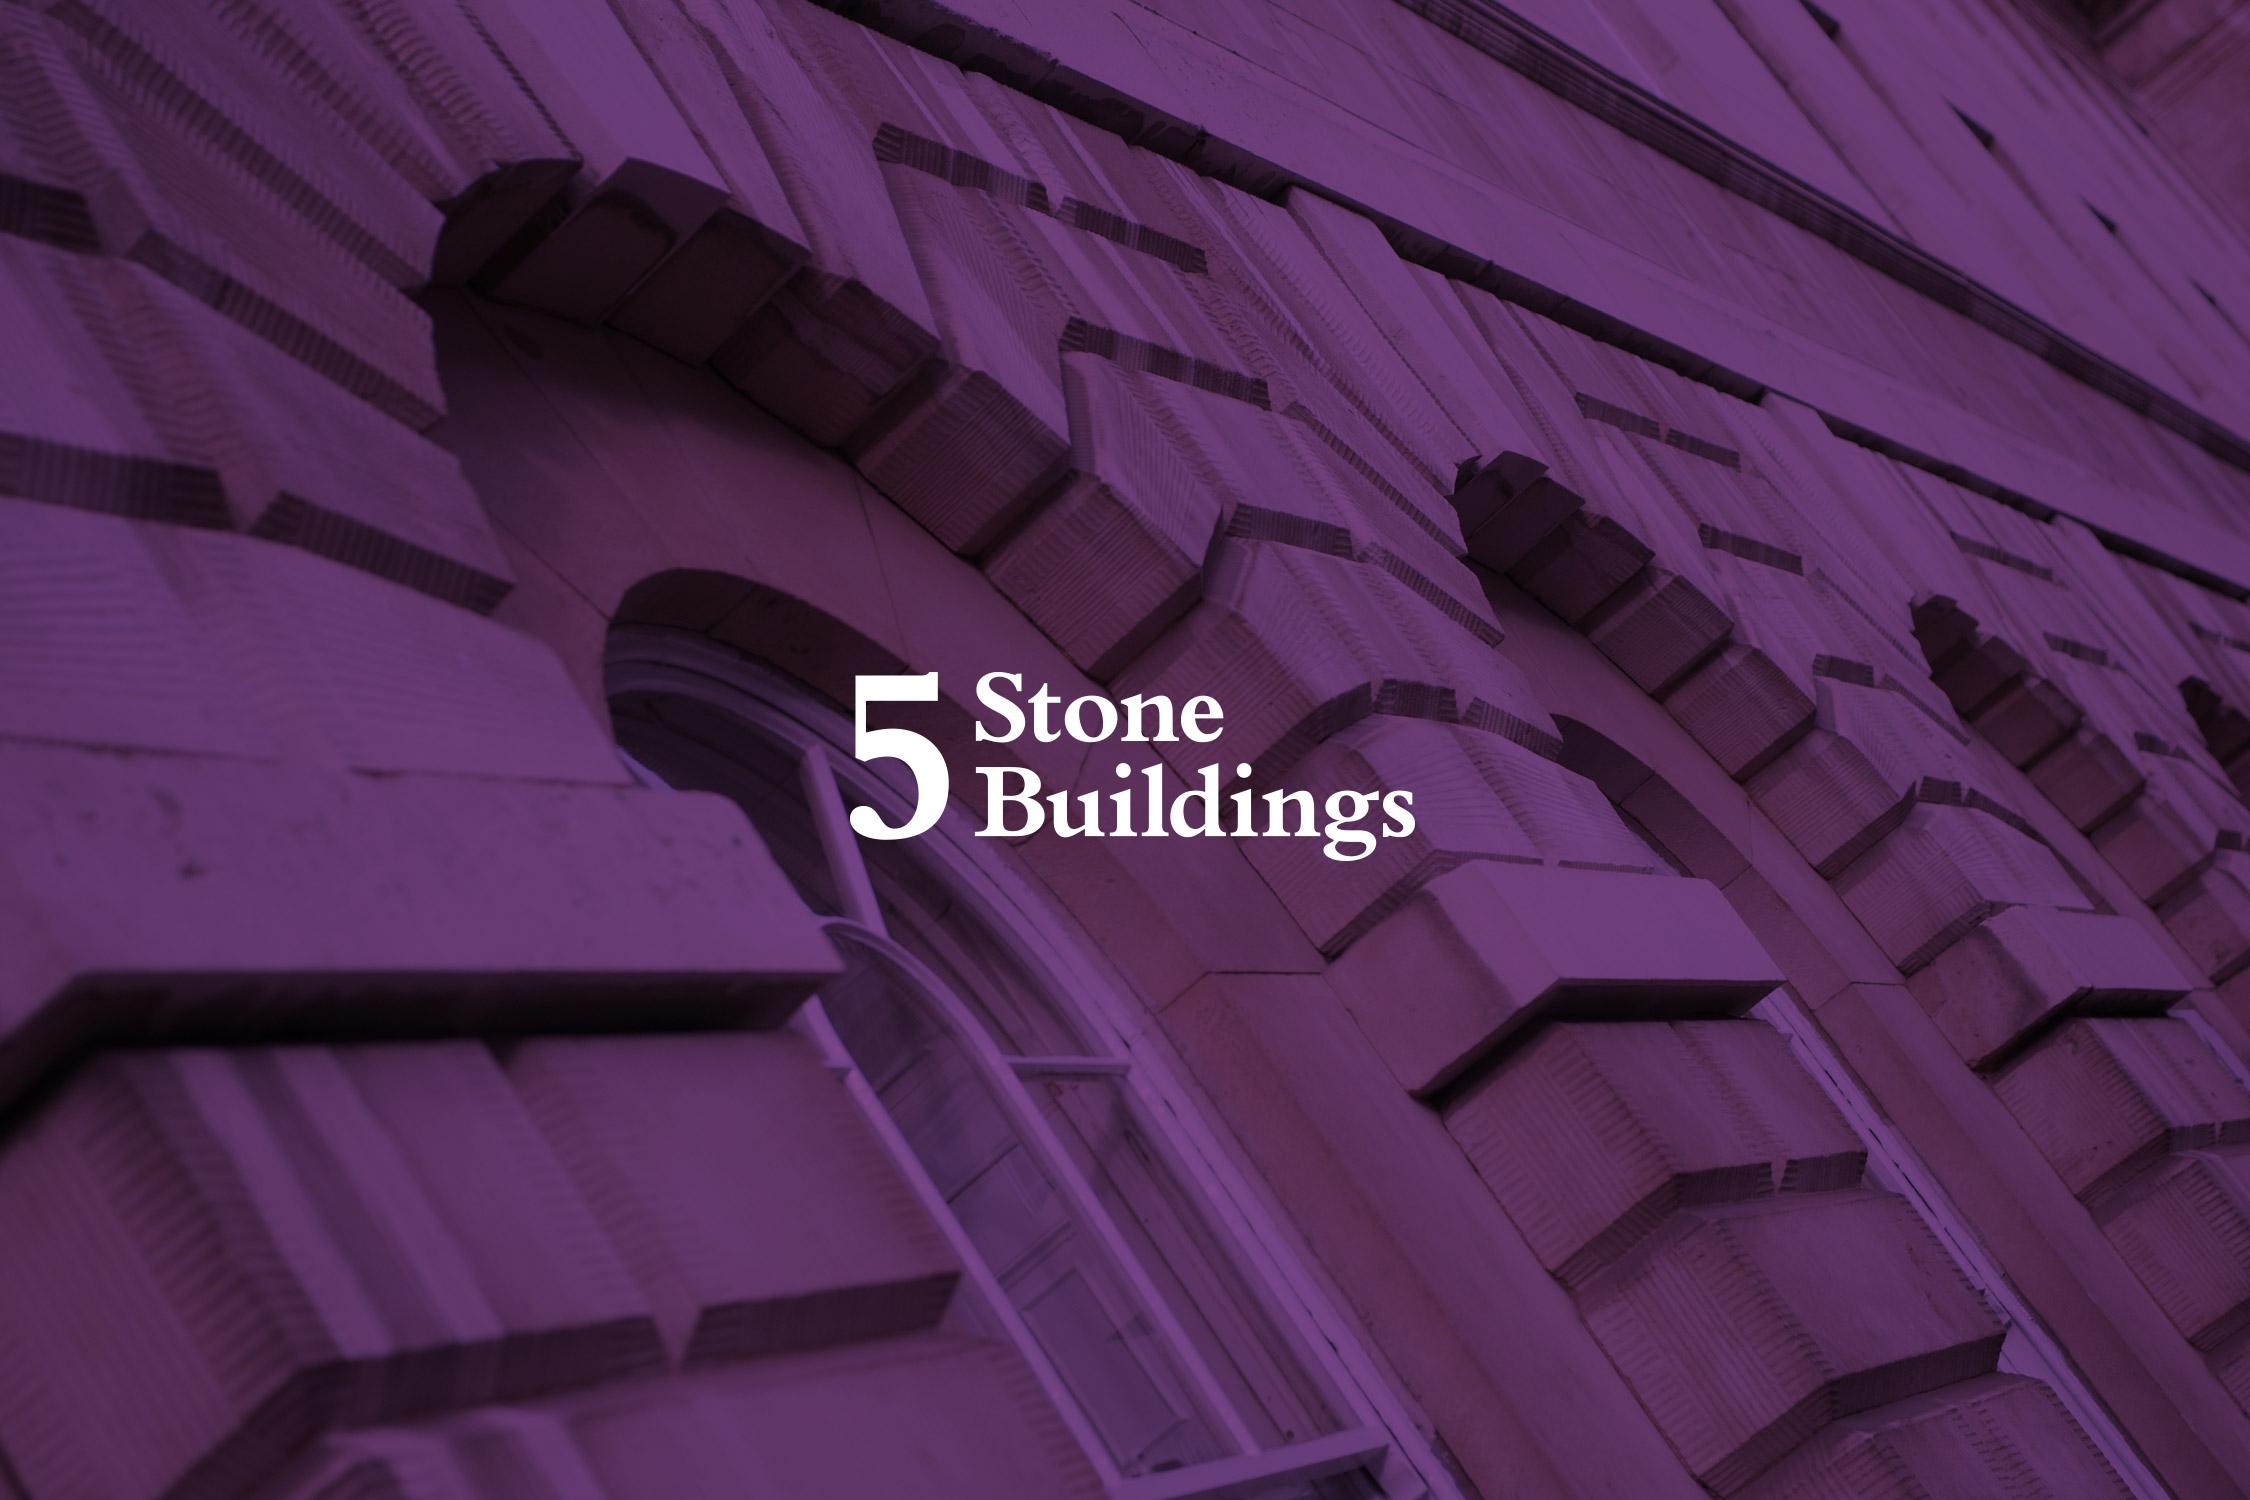 David Rees QC - 5 Stone Buildings